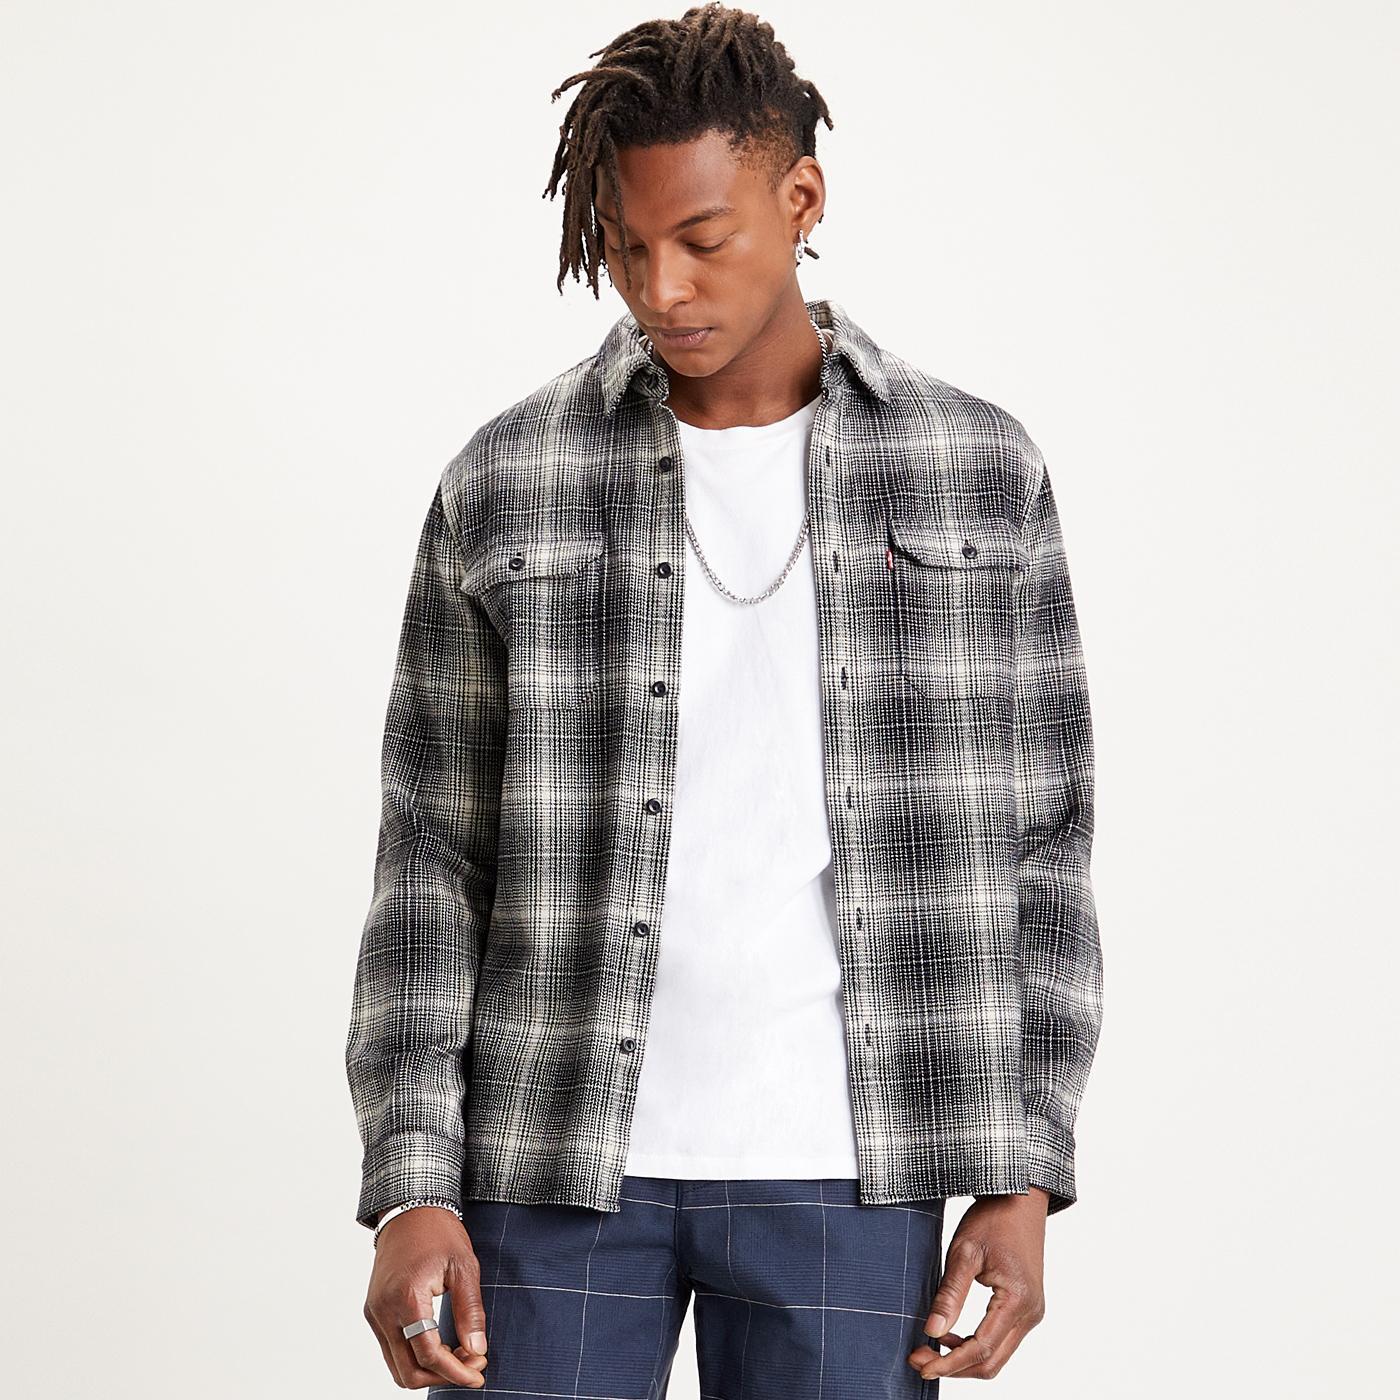 Jackson LEVI'S Retro Check Over Shirt (Jet Black)